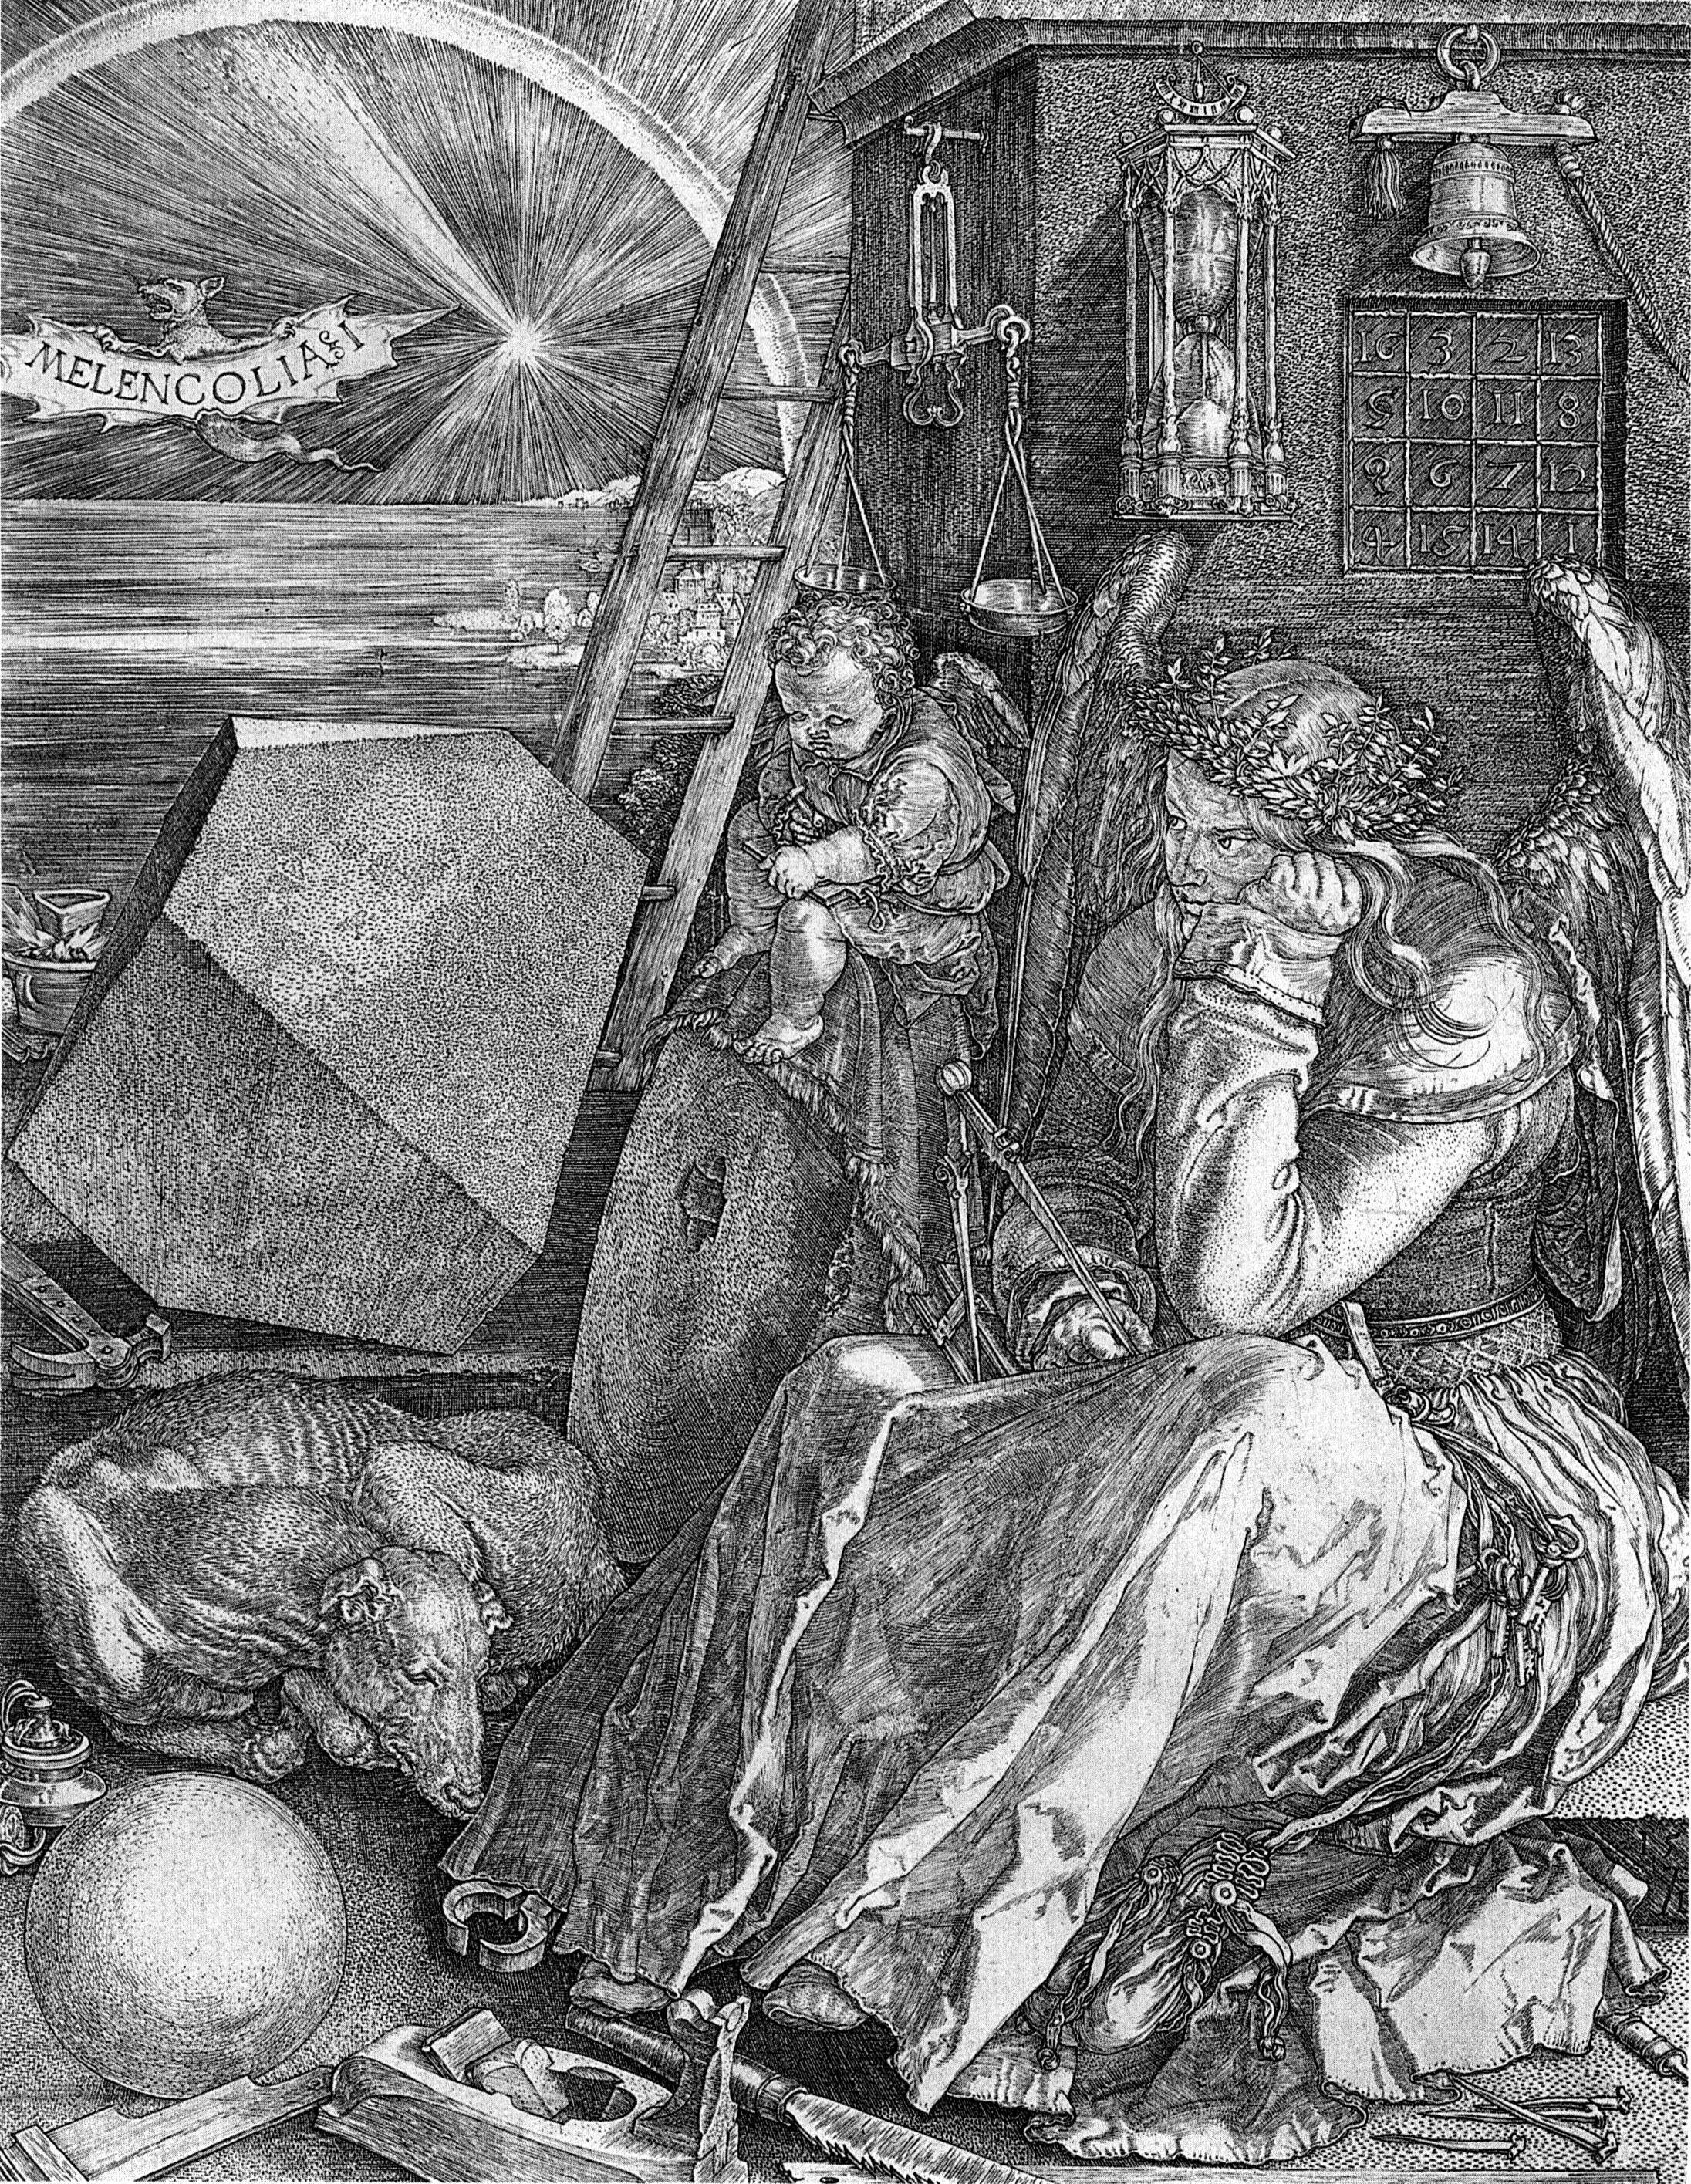 Http Upload Wikimedia Org Wikipedia Commons 1 18 D C3 Bcrer Melancholia I Jpg Albrecht Durer Albrecht Durer Renaissance Art